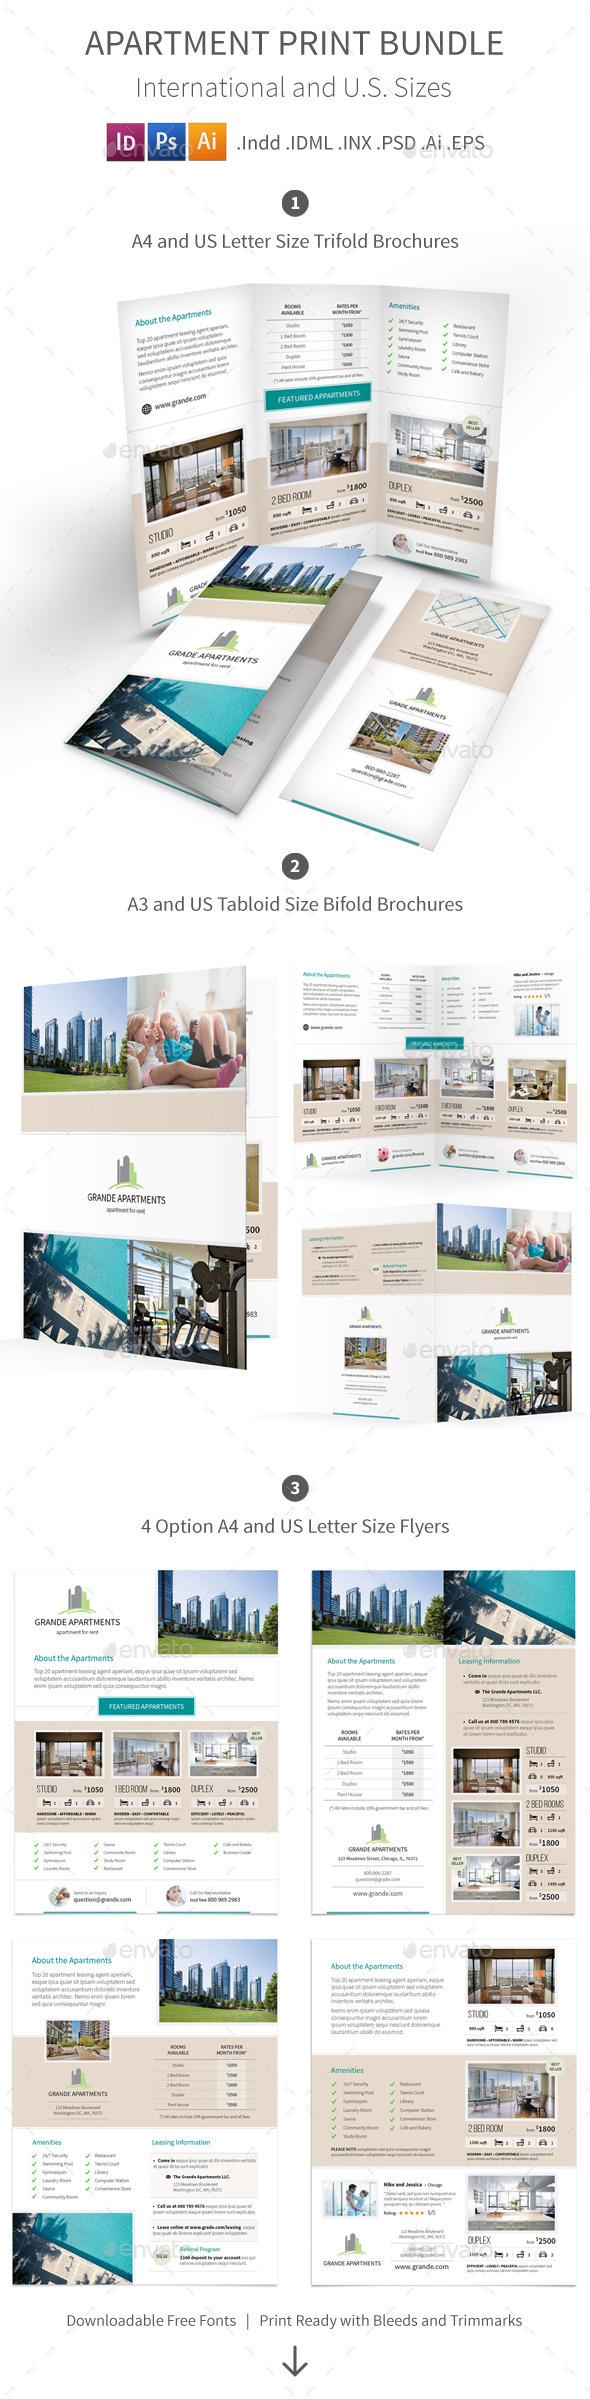 Apartment Real Estate Print Bundle - Informational Brochures